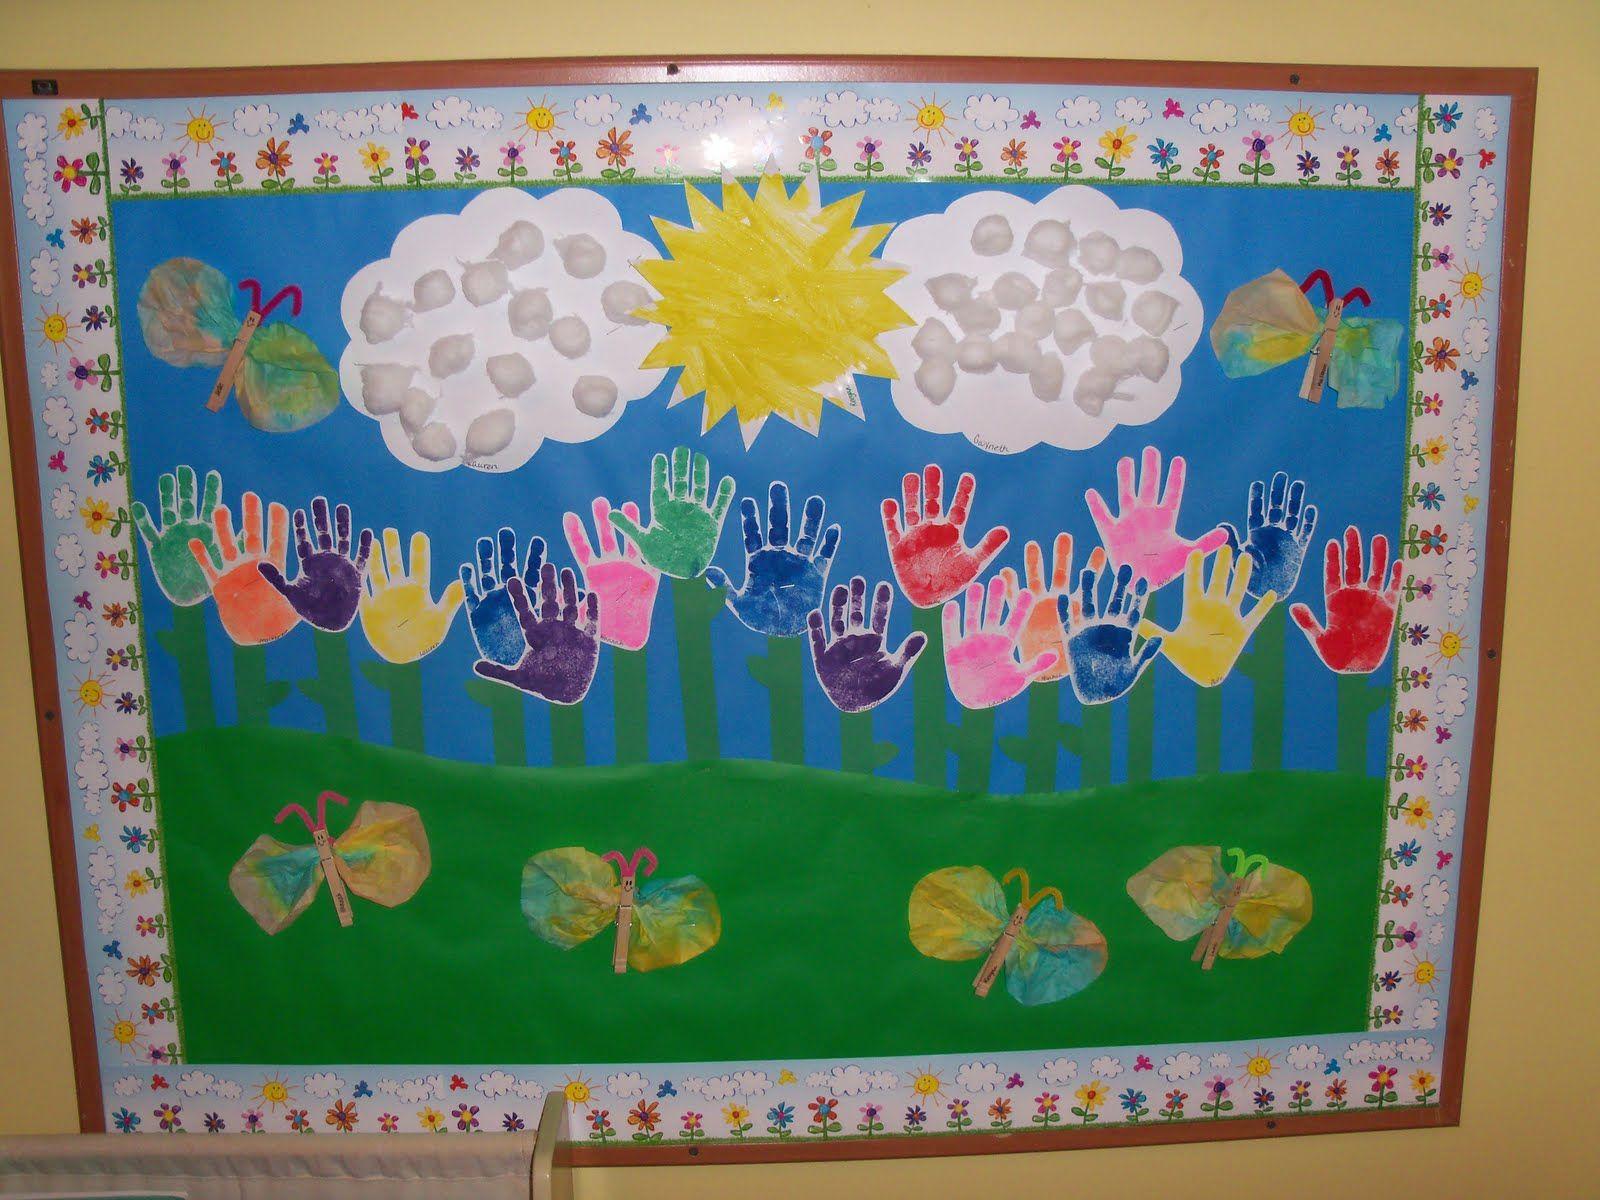 Classroom Calendar Bulletin Board Ideas : Spring craft ideas the thoughtful spot day care